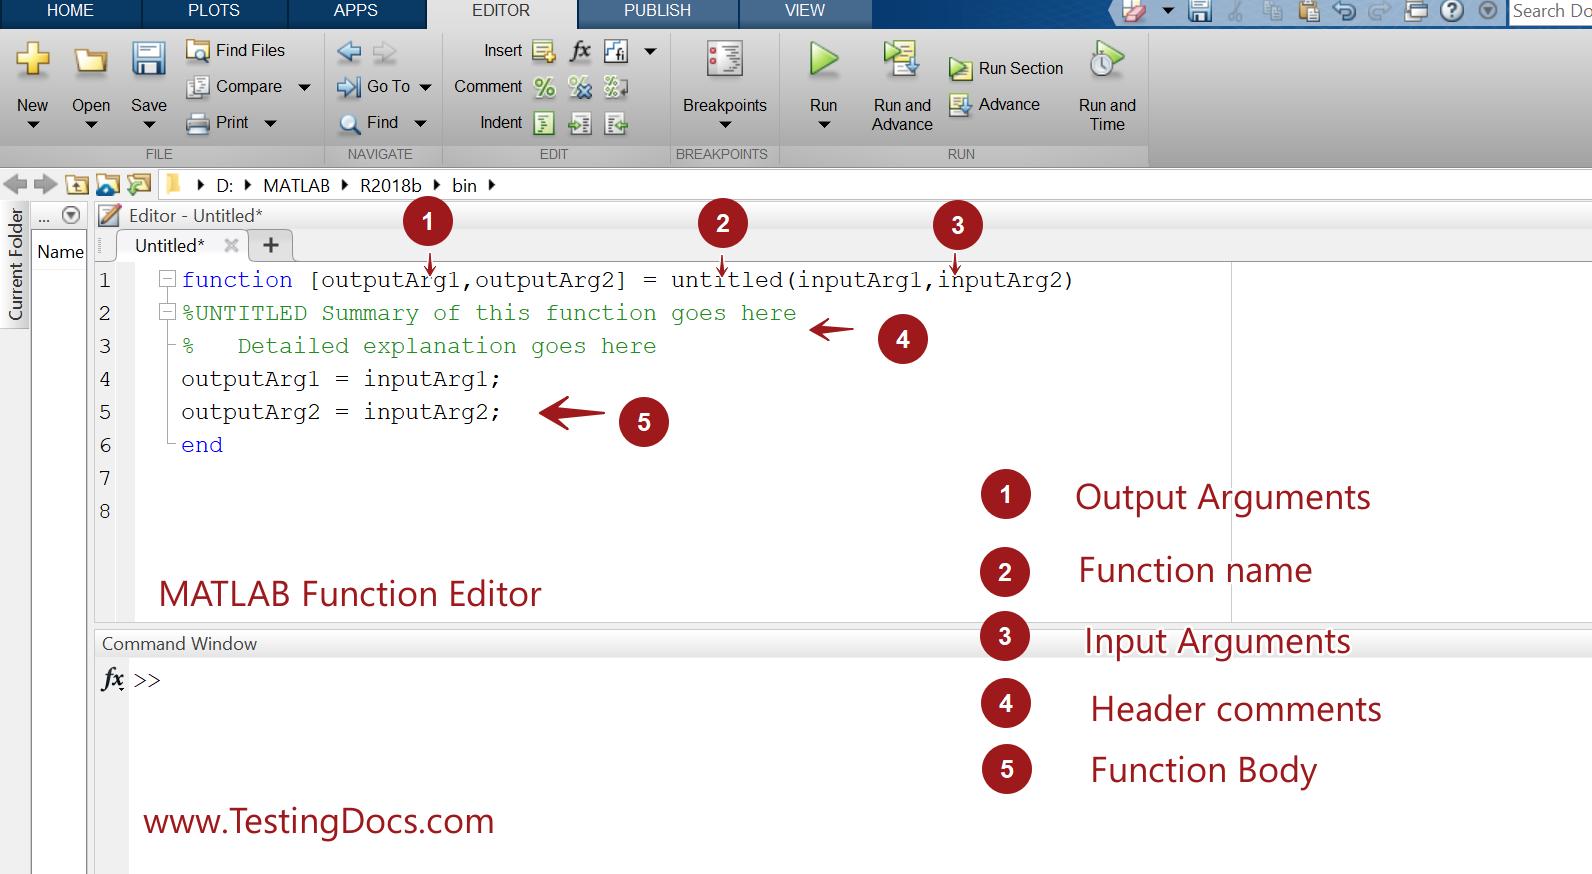 MATLAB Function Editor